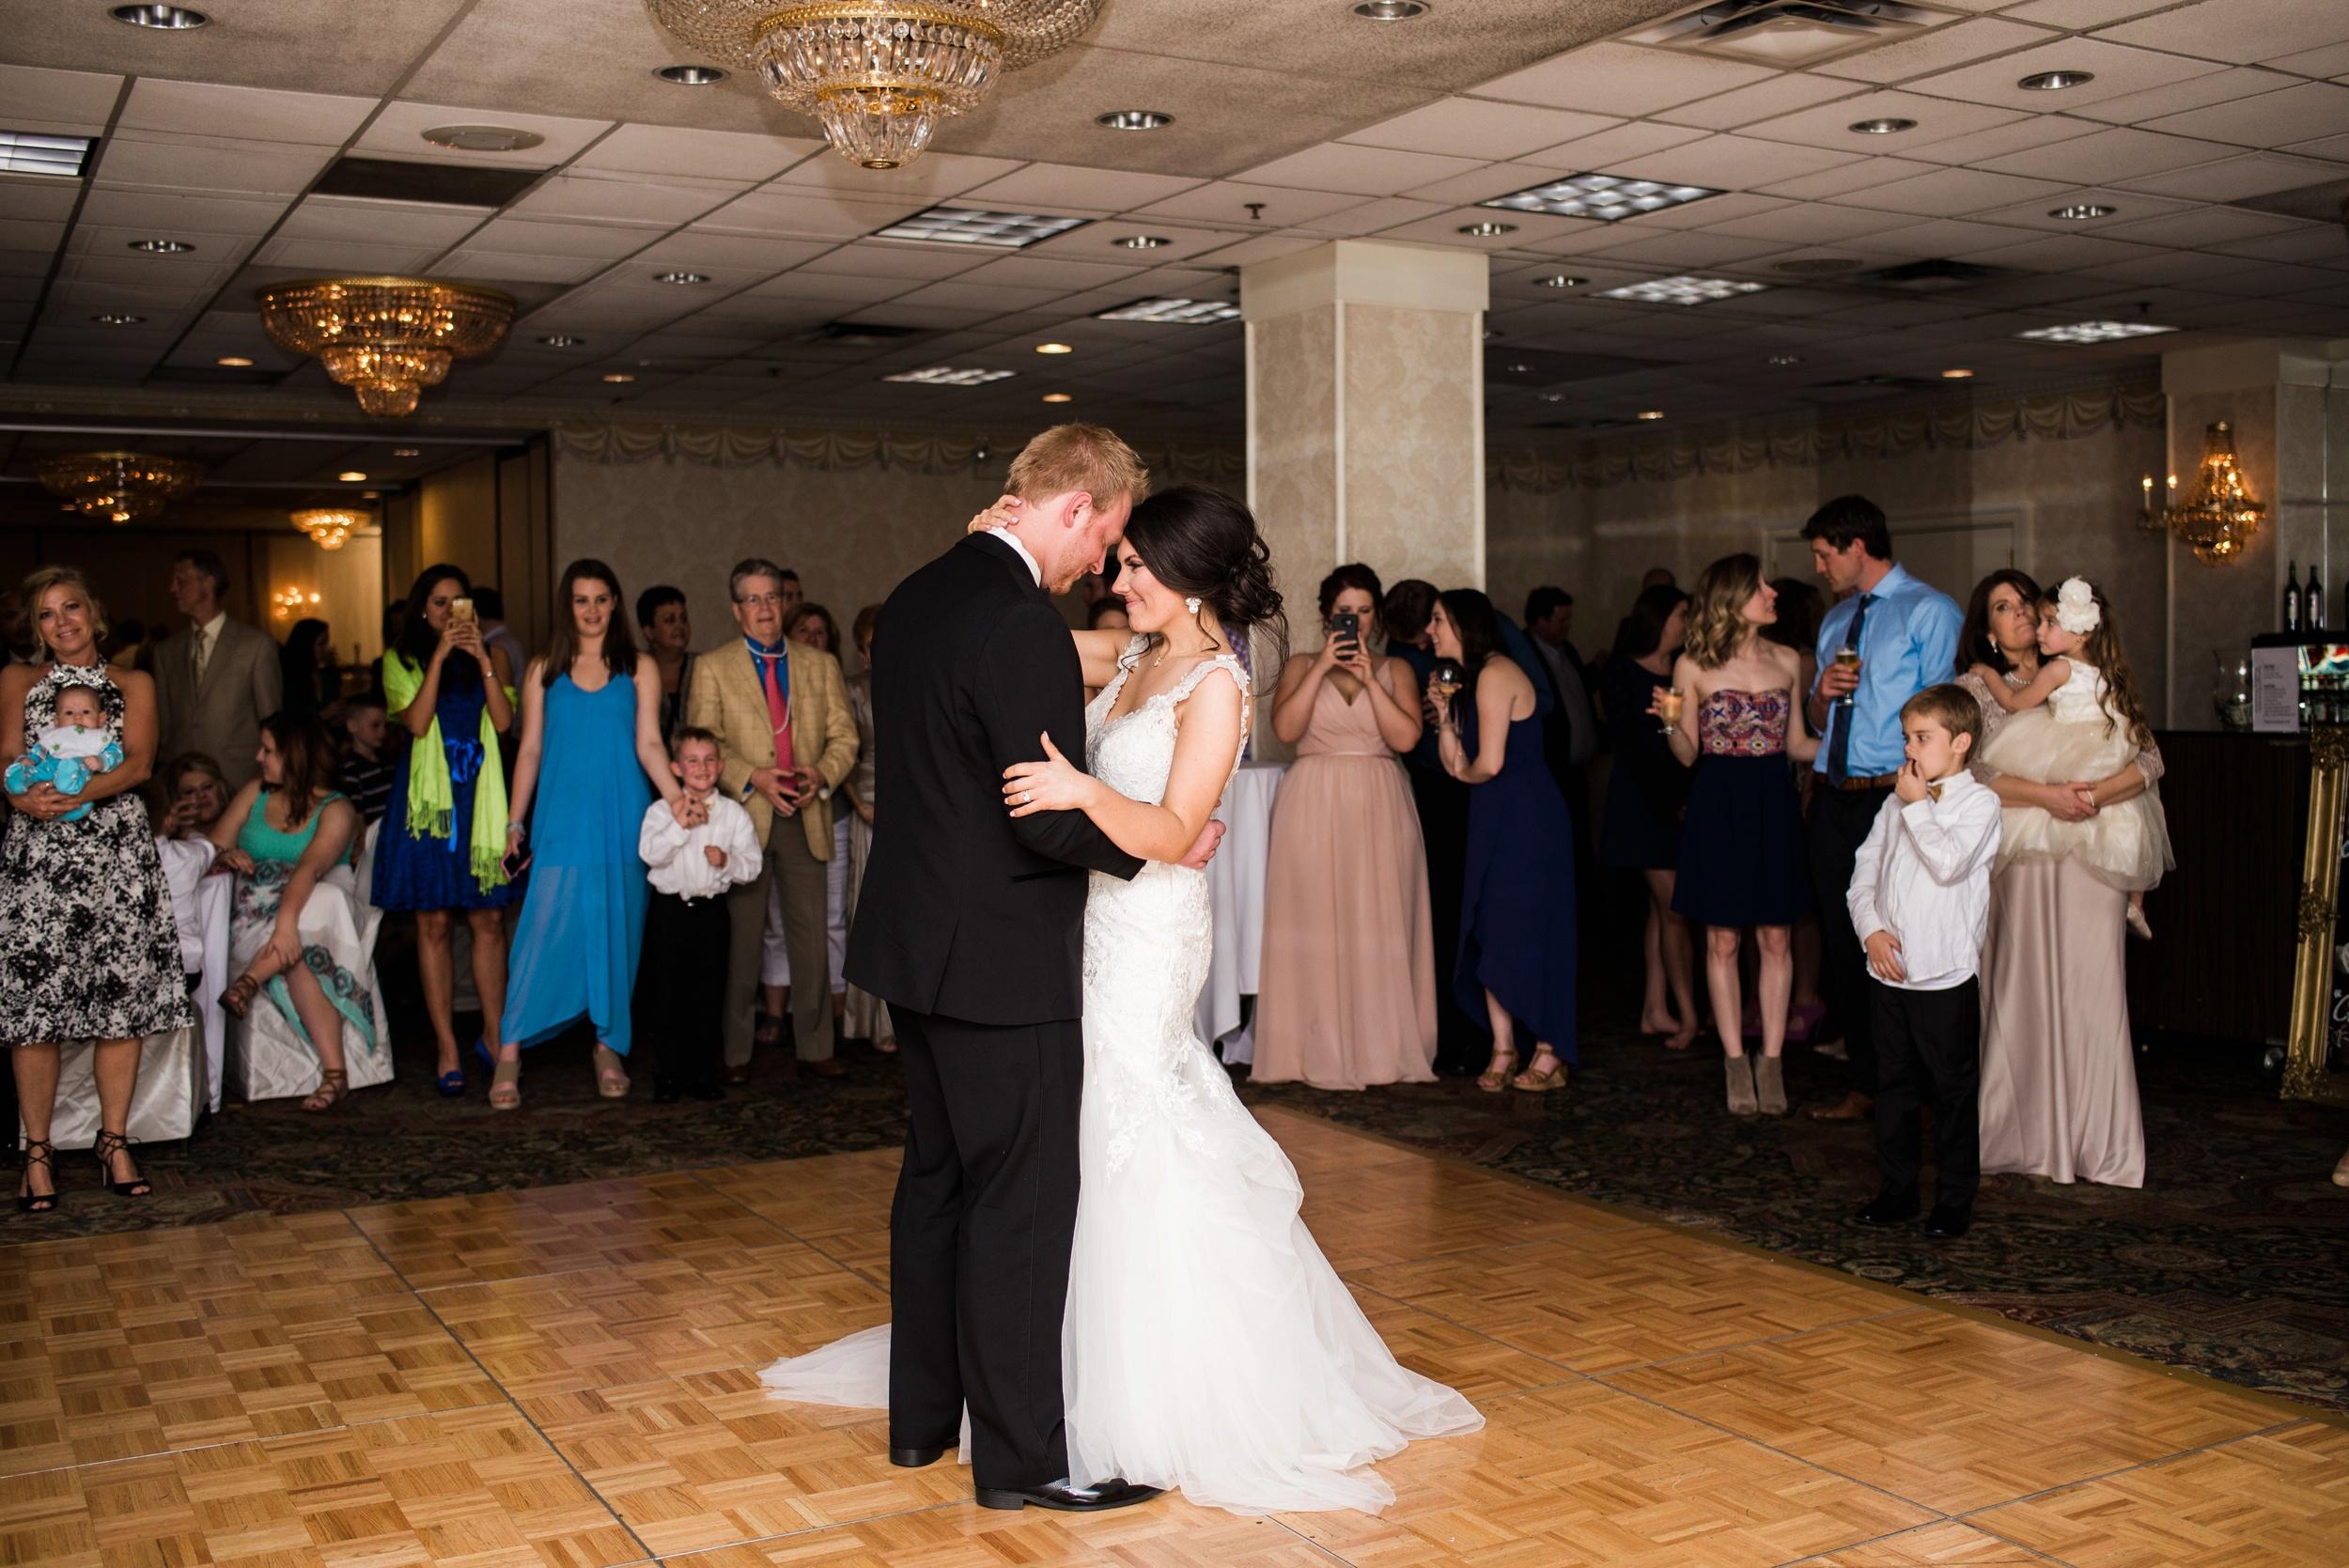 Downtown Des Moines Wedding Photographer_2141.jpg